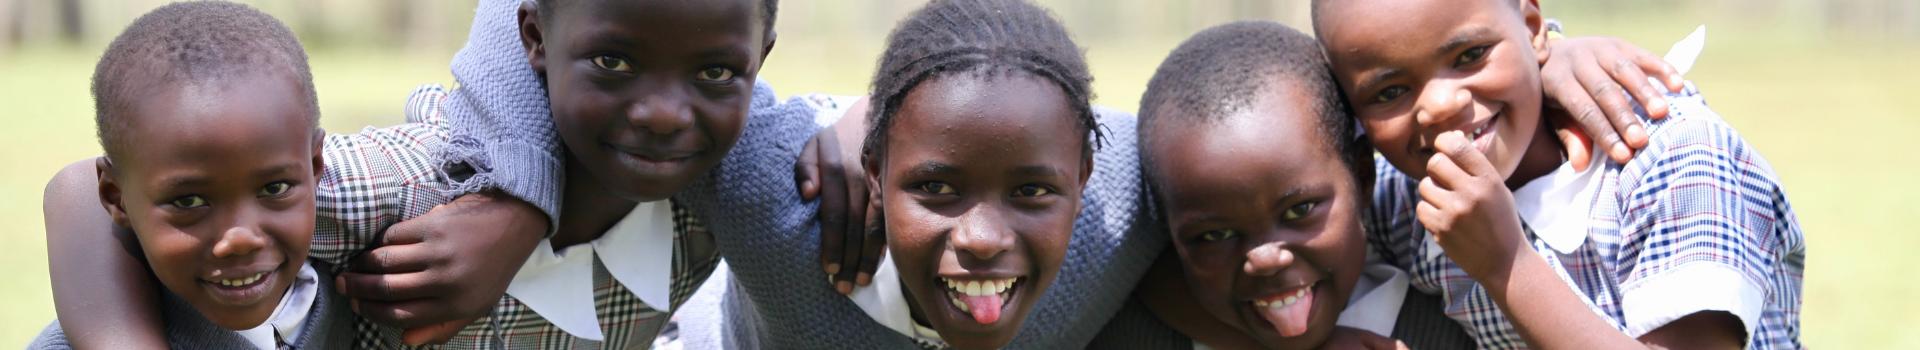 Young smiling school girls in Kenya